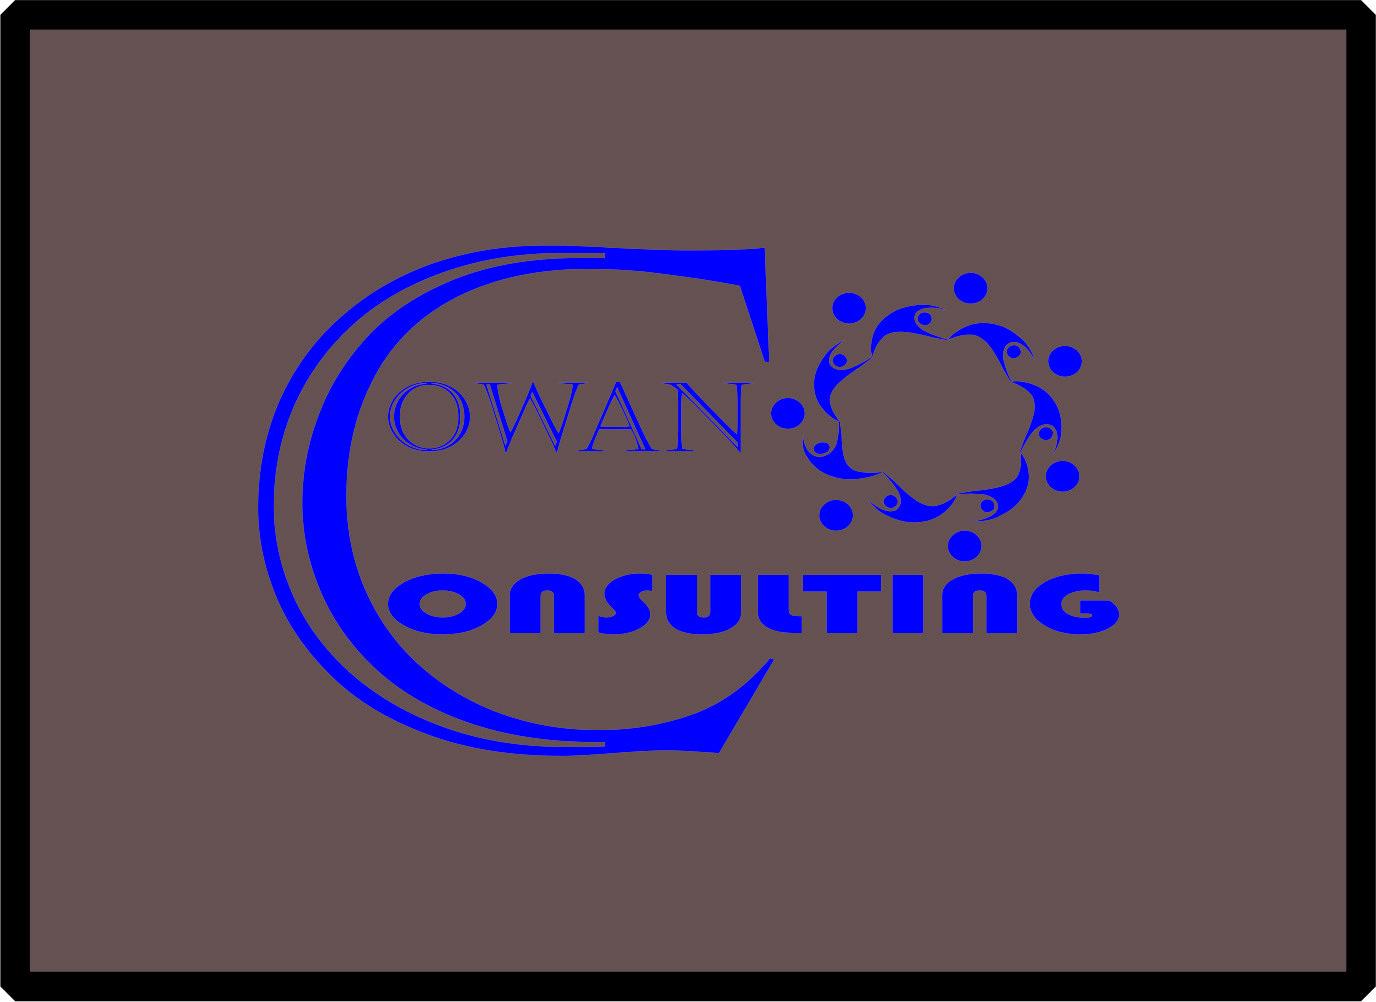 Logo Design by Teguh Hanuraga - Entry No. 17 in the Logo Design Contest Fun Logo Design for Cowan Environmental Consulting.